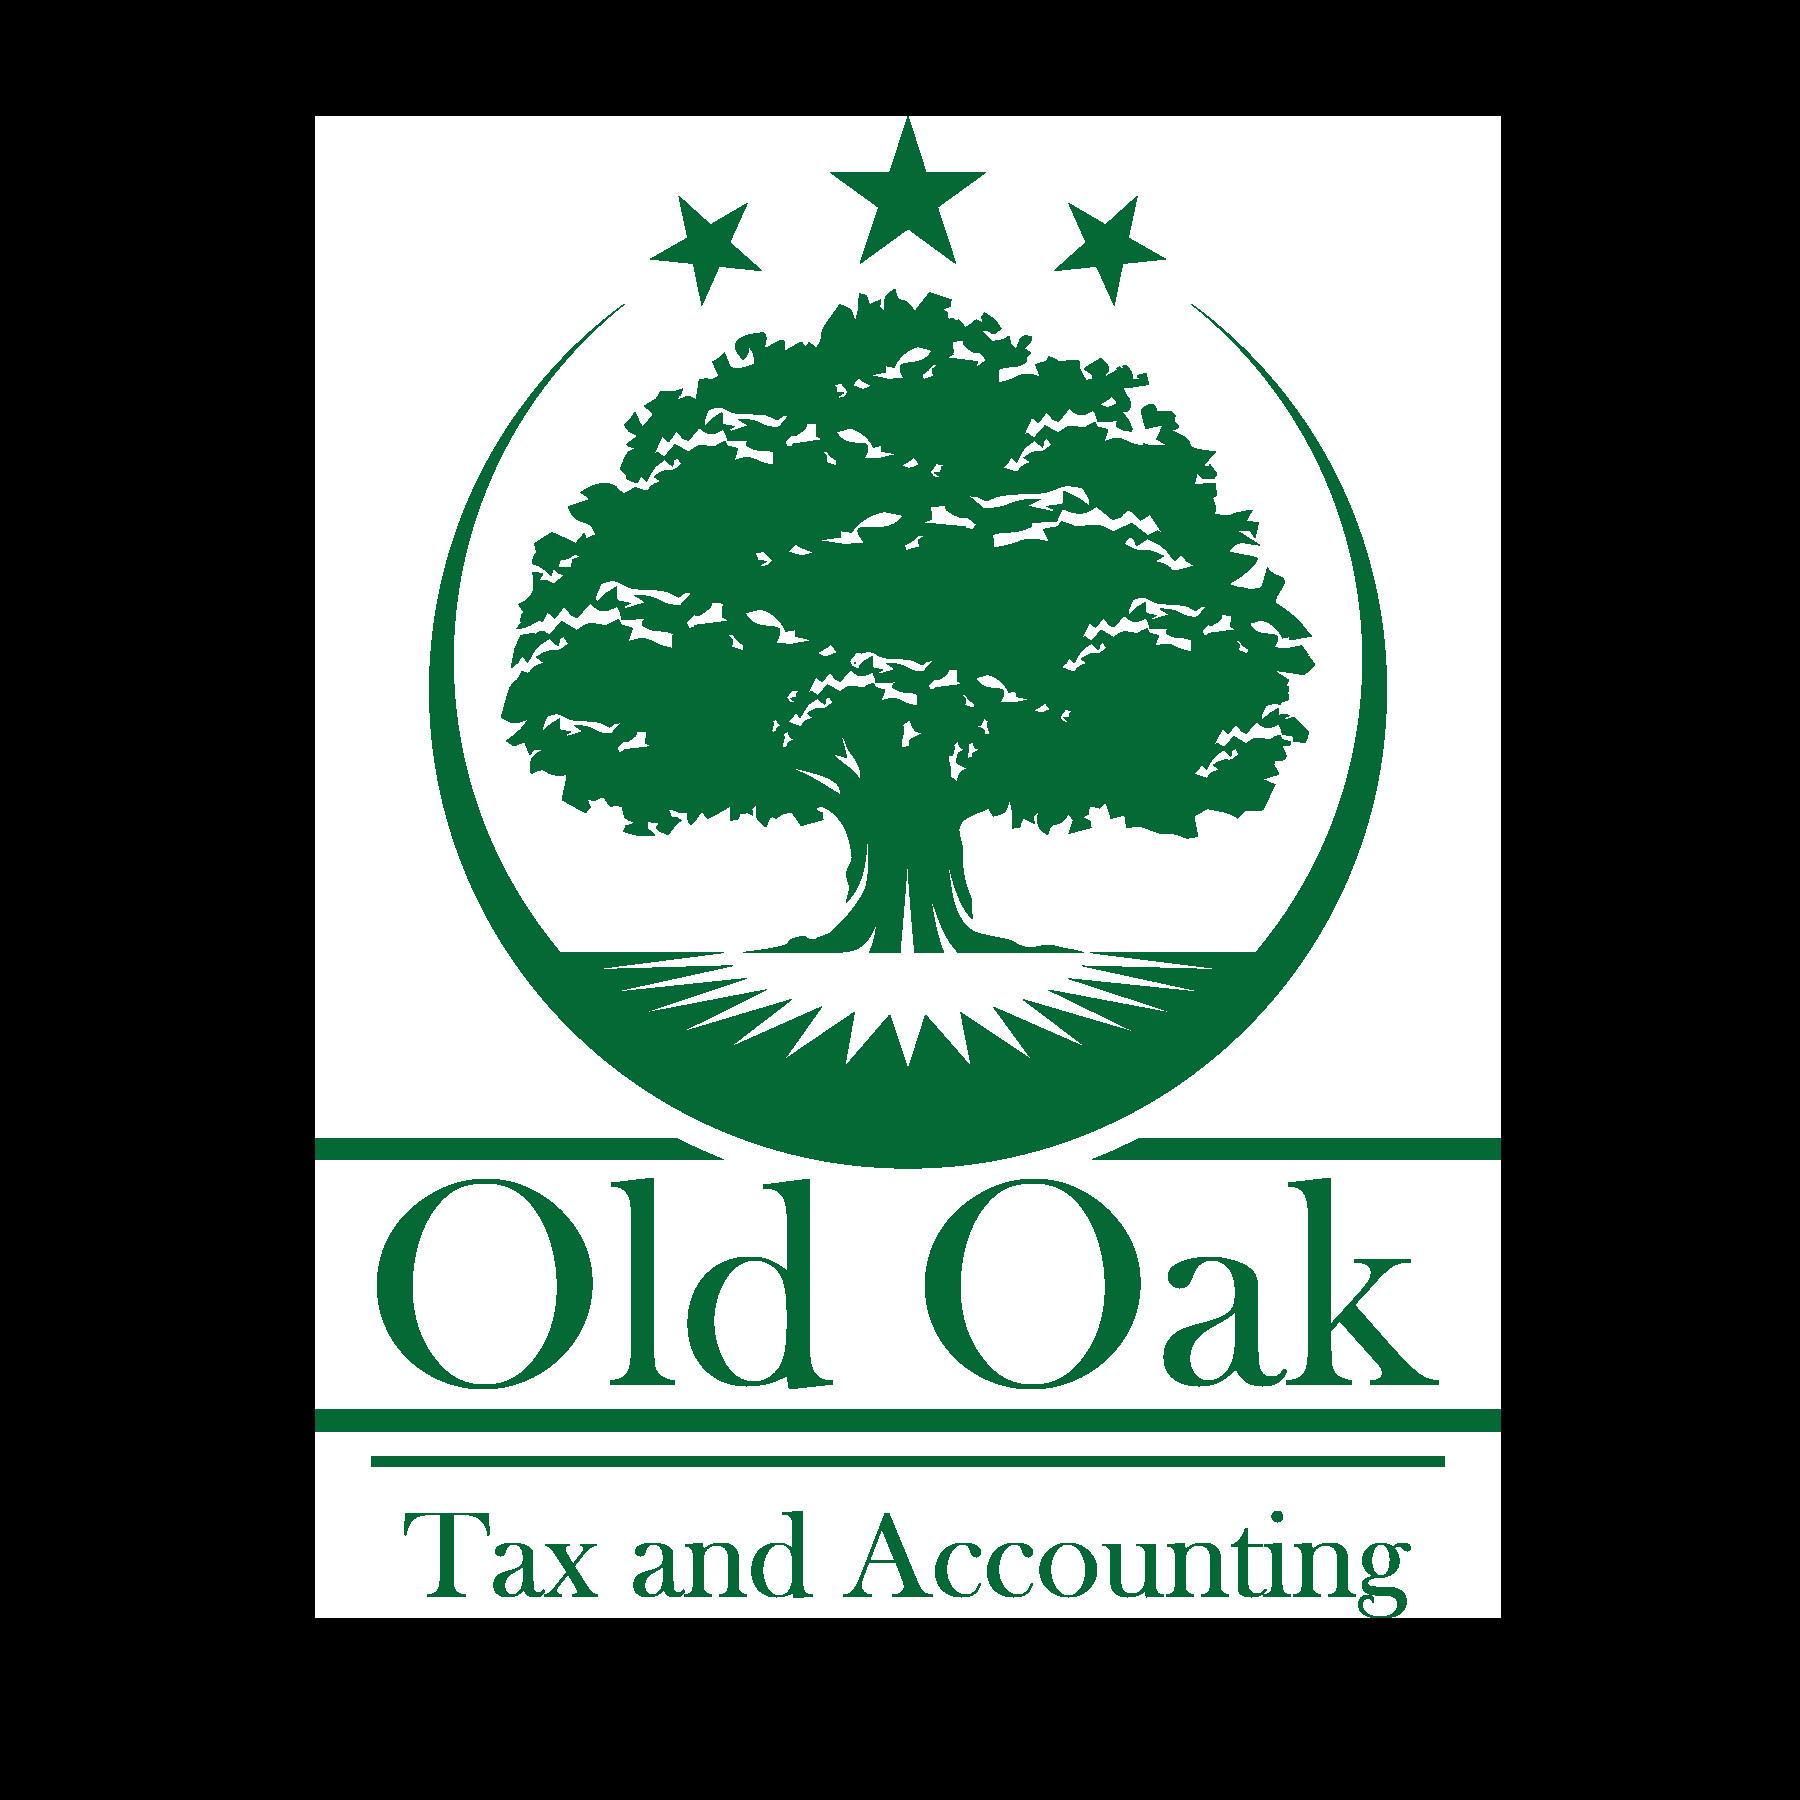 Old Oak Tax & Accounting